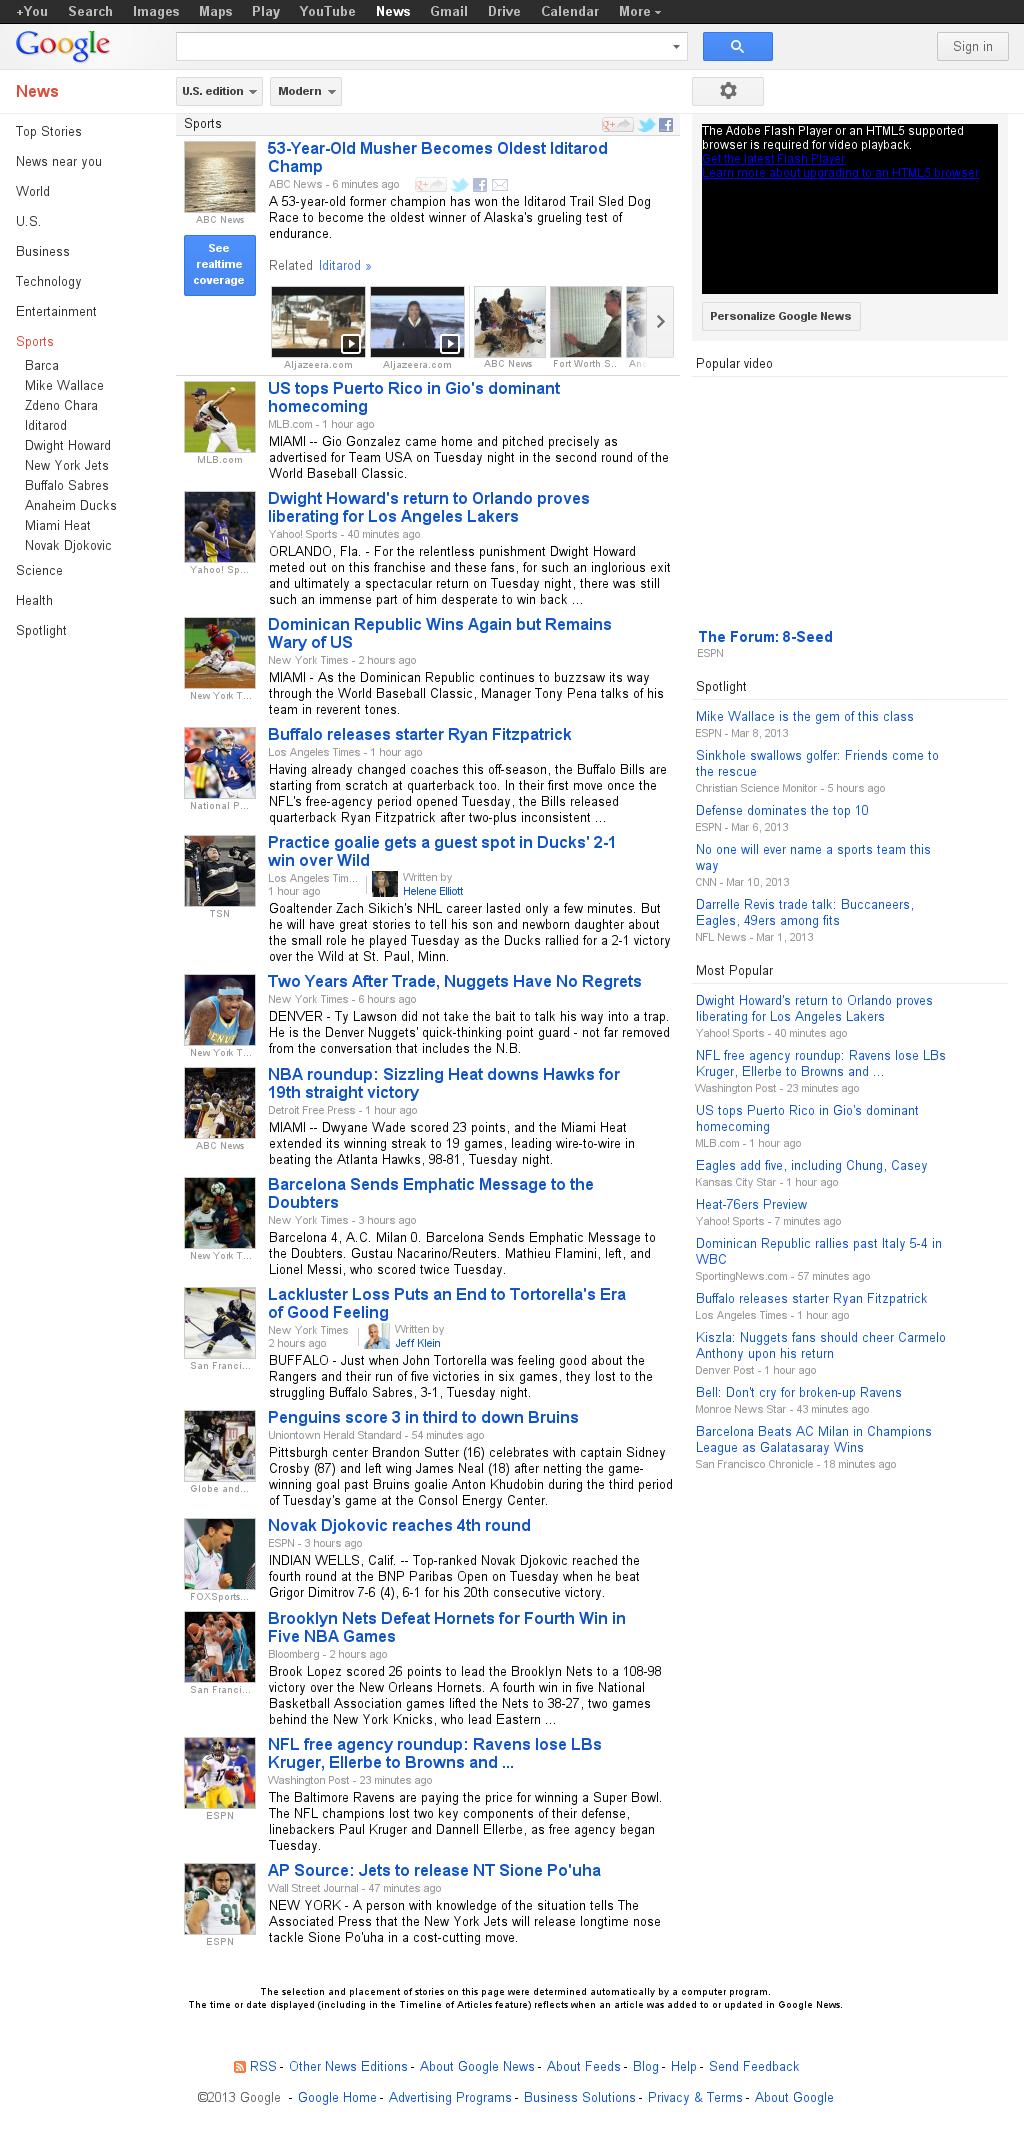 Google News: Sports at Wednesday March 13, 2013, 7:07 a.m. UTC